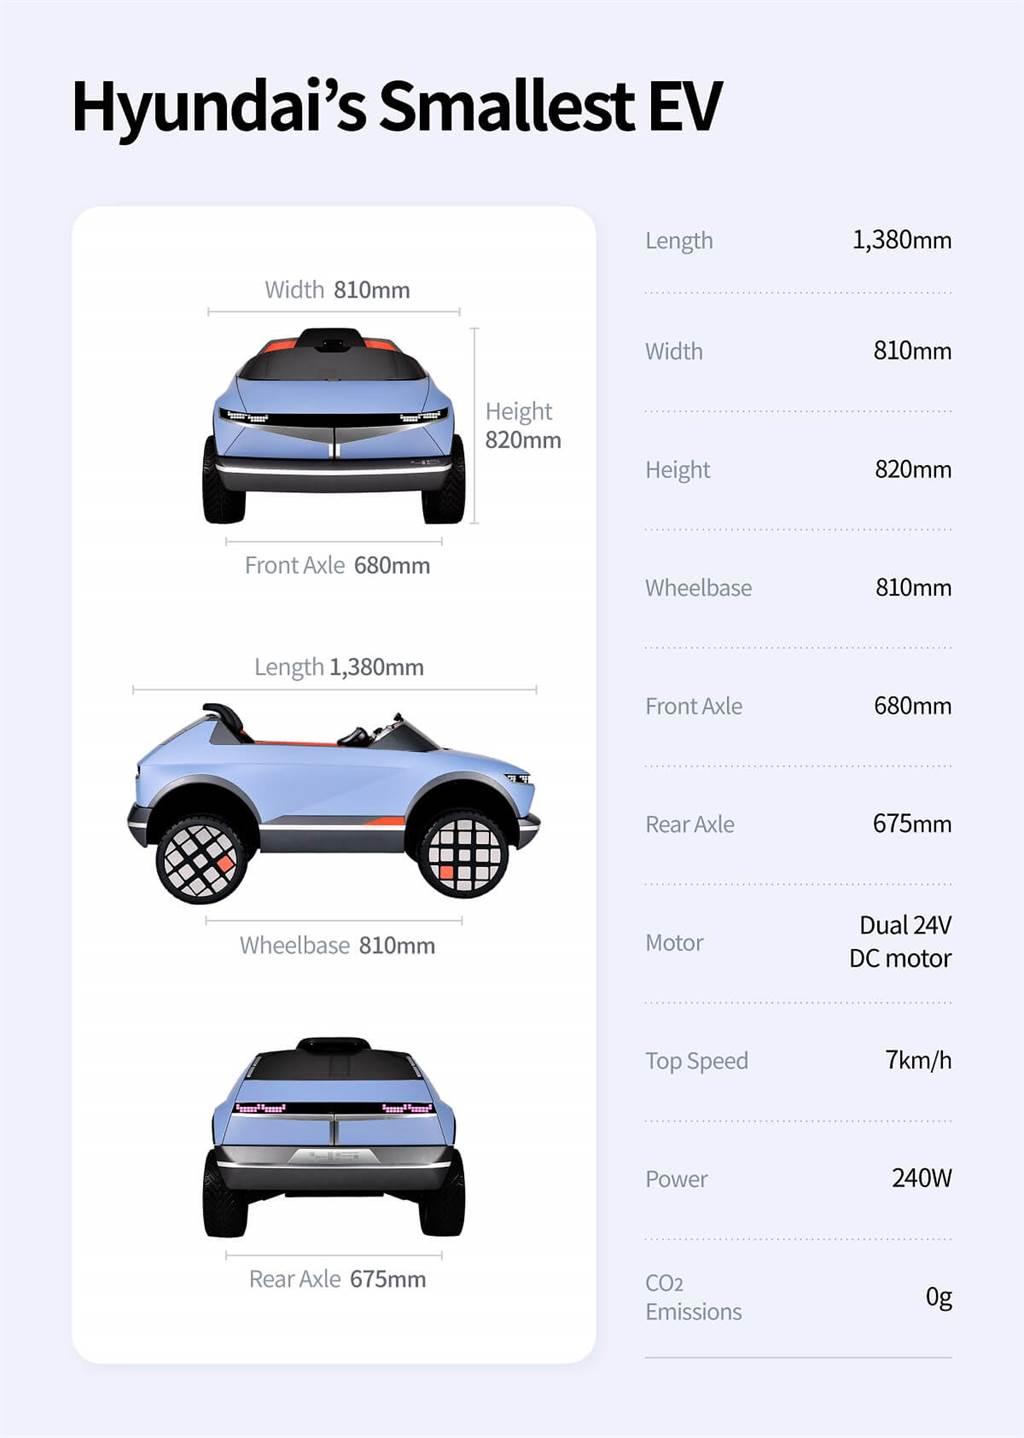 Hyundai推出無名超迷你電動車